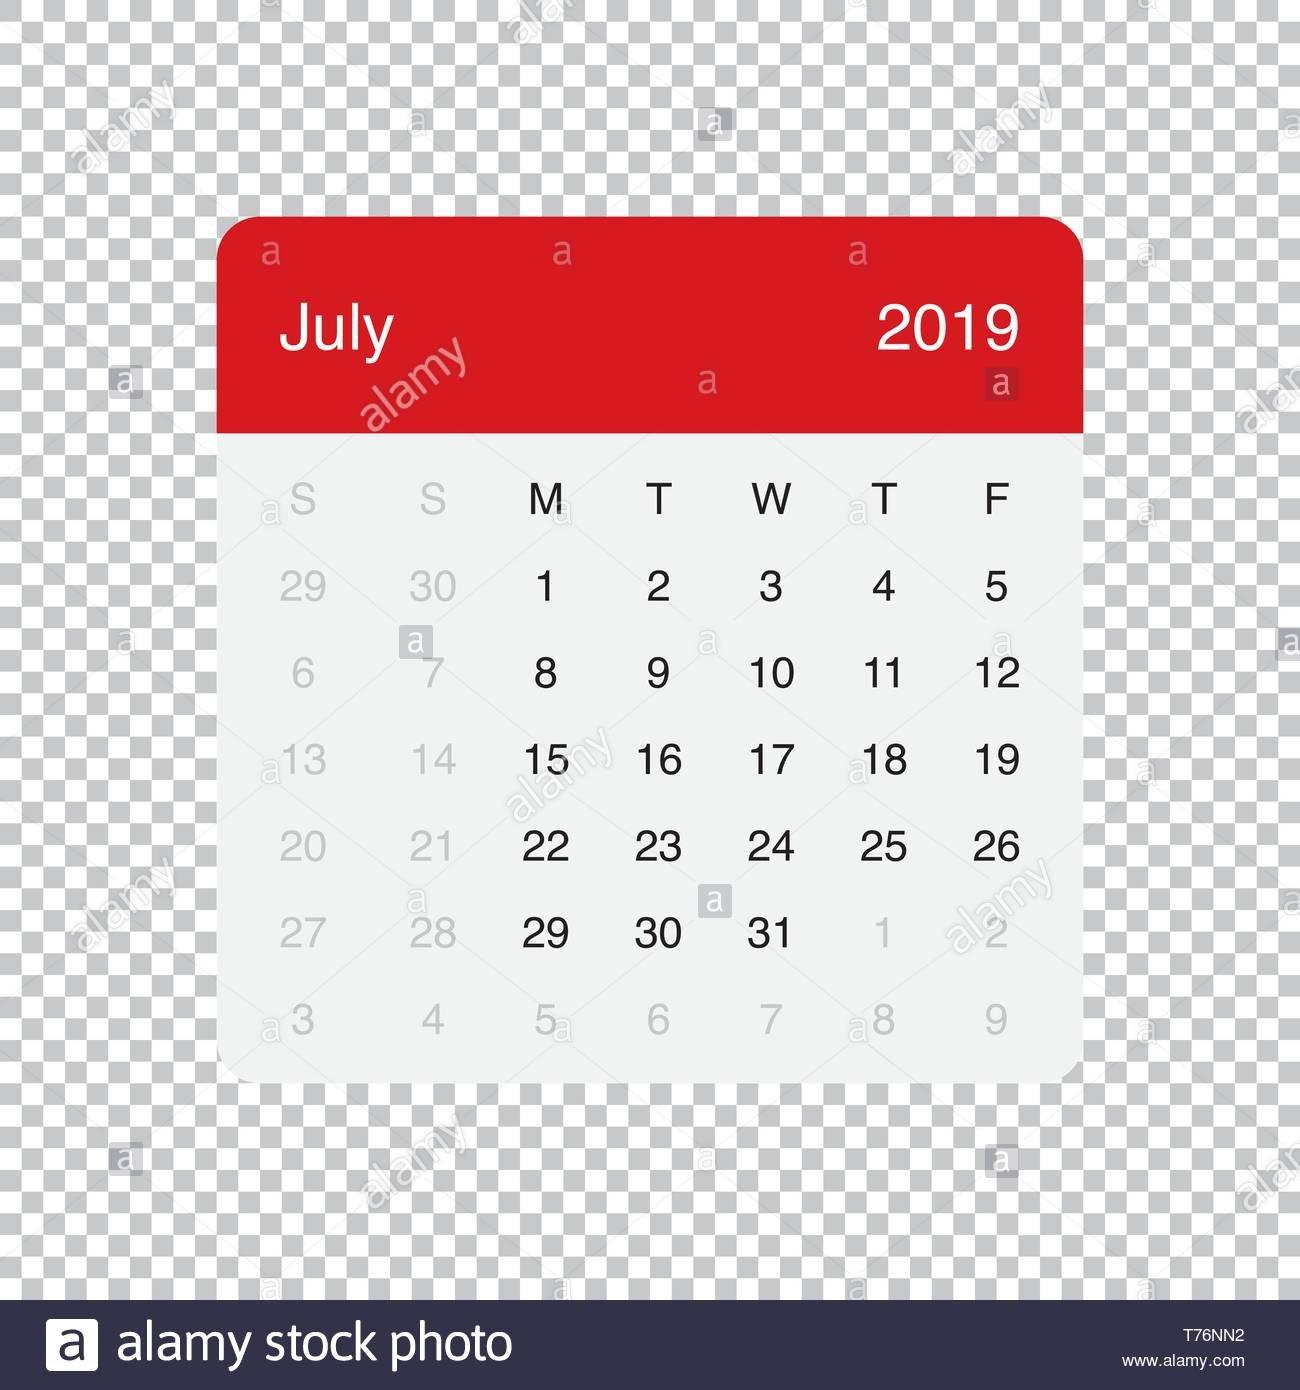 July 2019 Calendar Stock Photos & July 2019 Calendar Stock Images Calendar July 4 2019